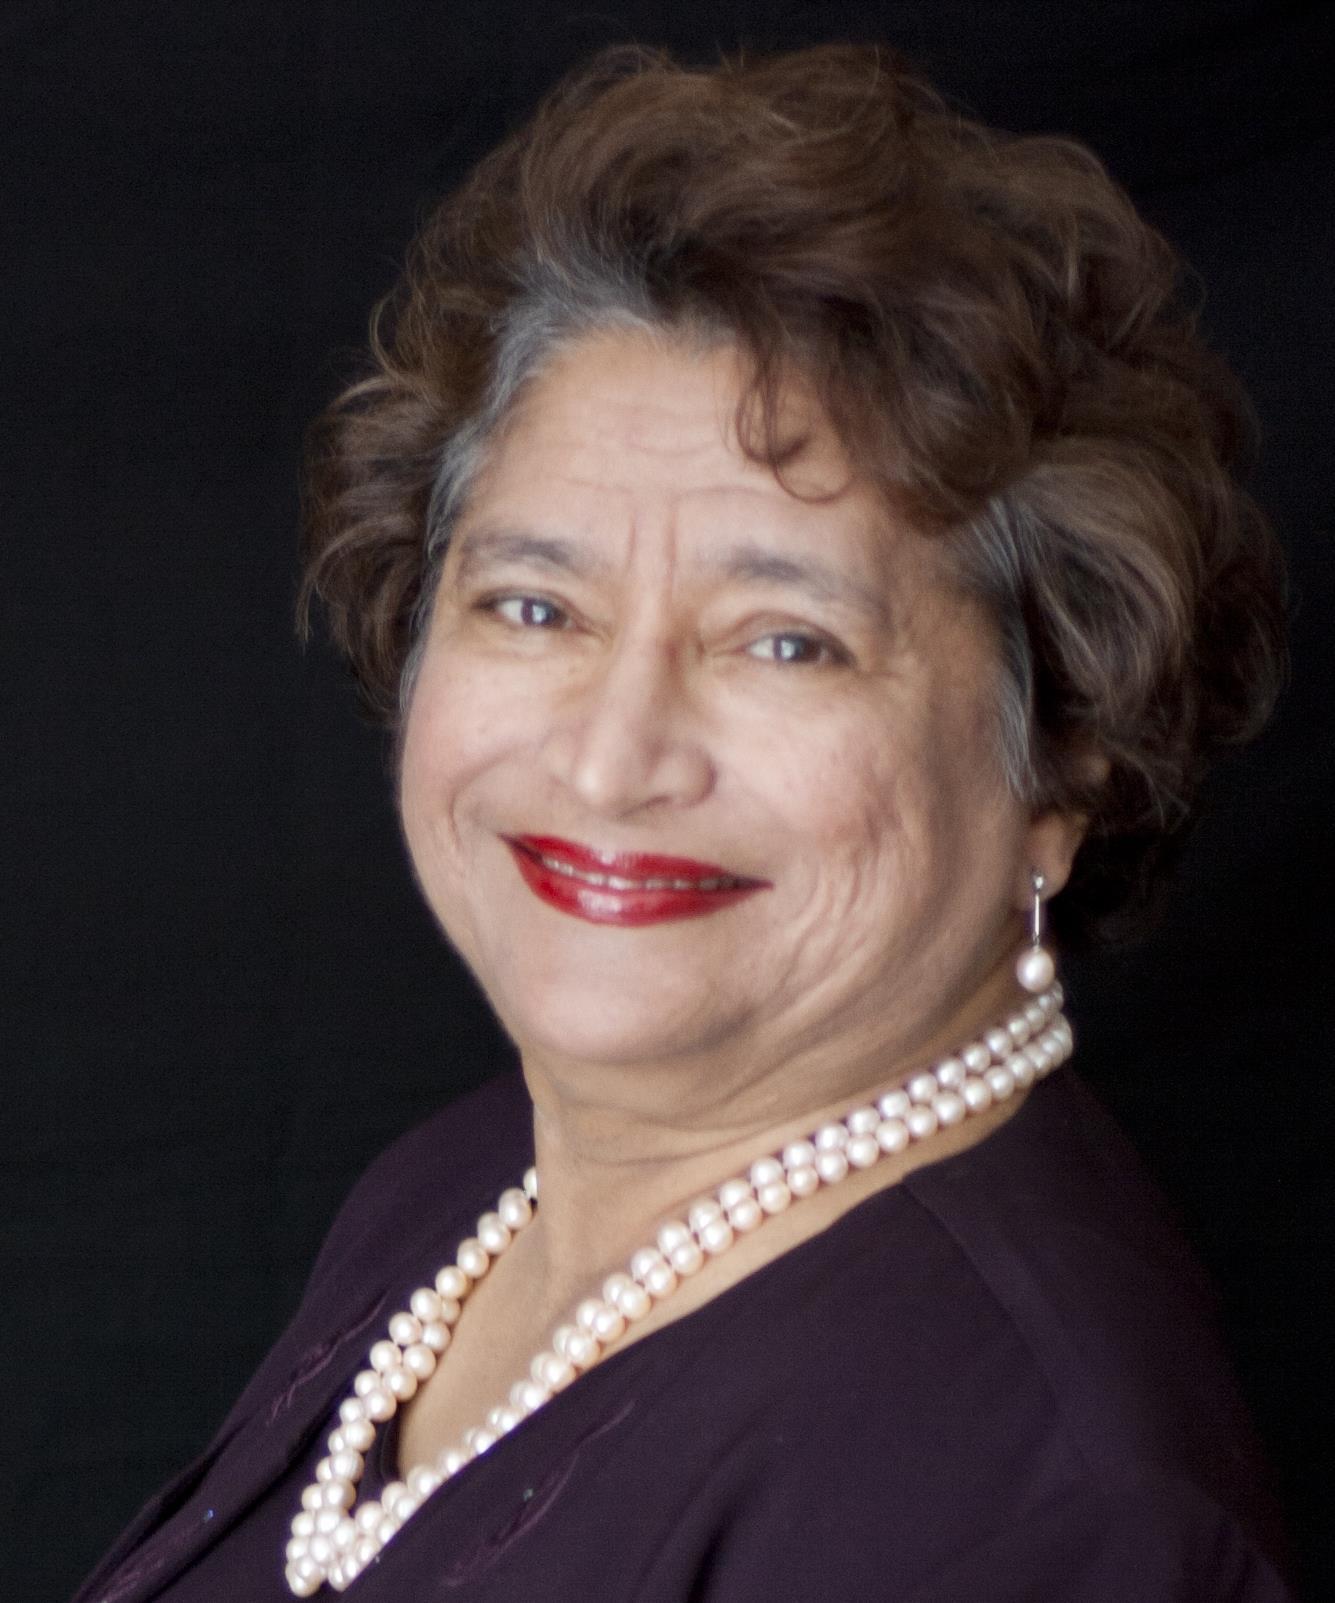 Akeela Davis